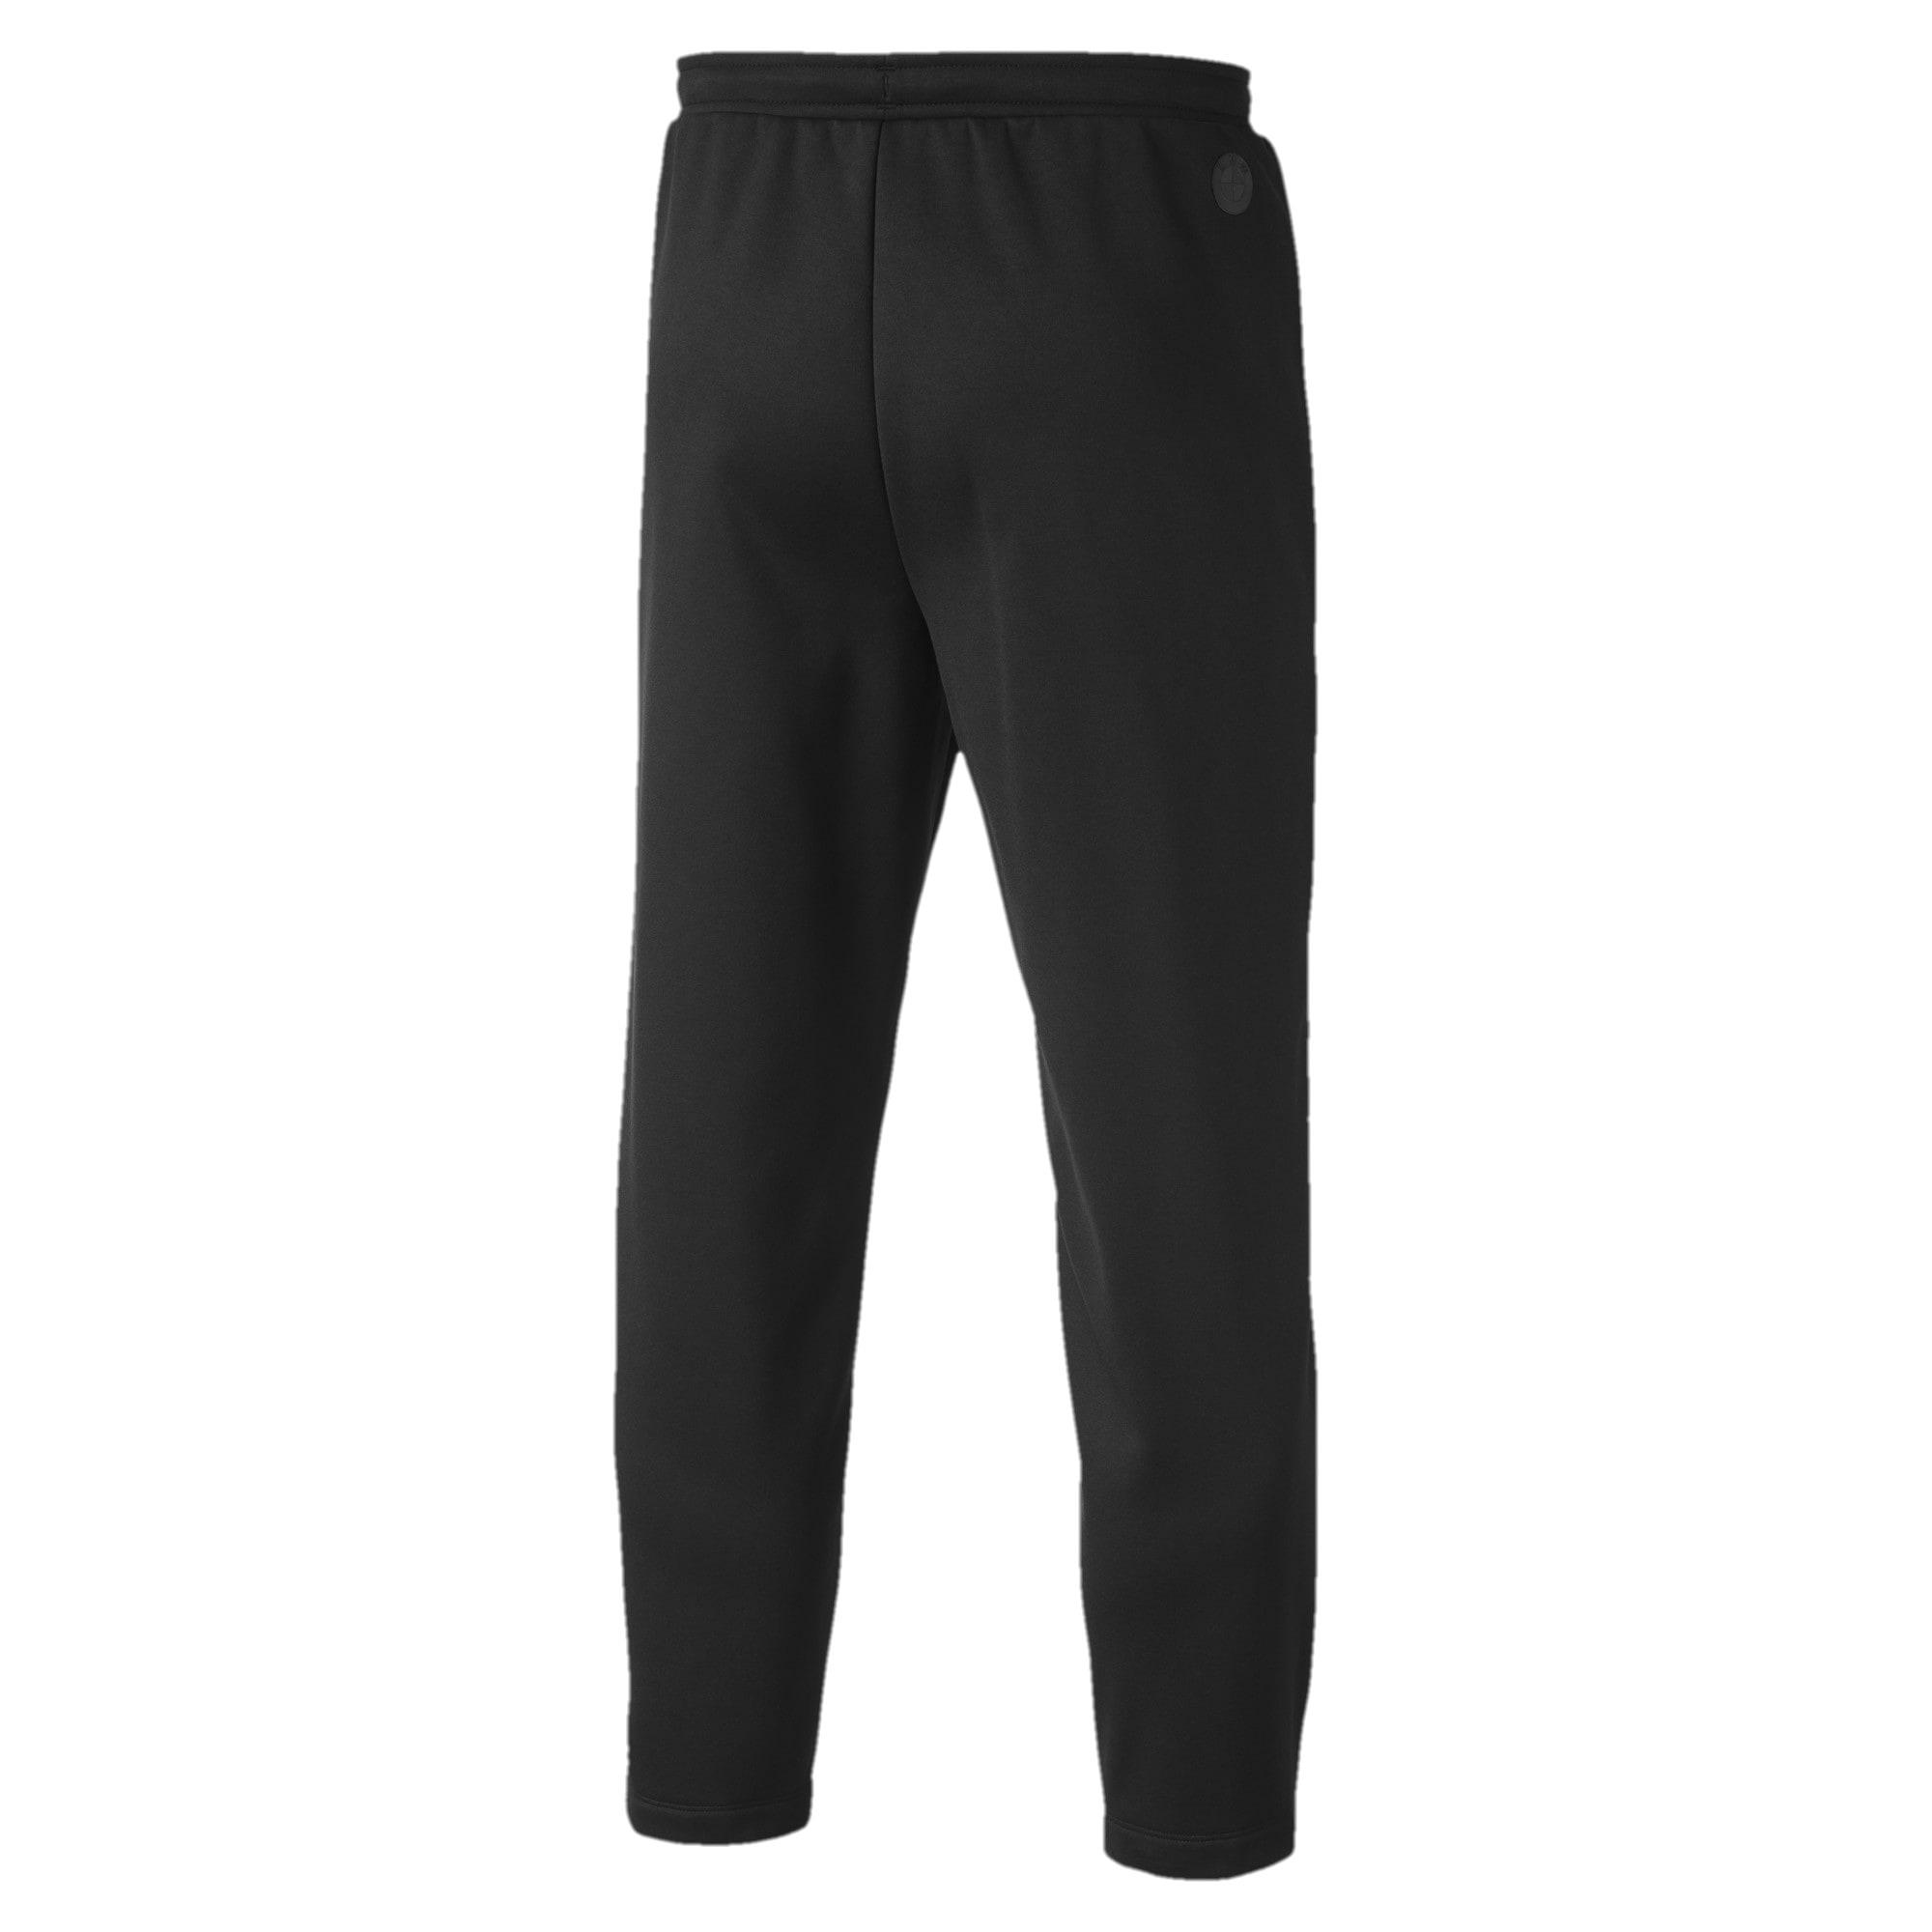 Miniatura 2 de Pantalones deportivos BMW M  Motorsport Life para hombre, Puma Black, mediano